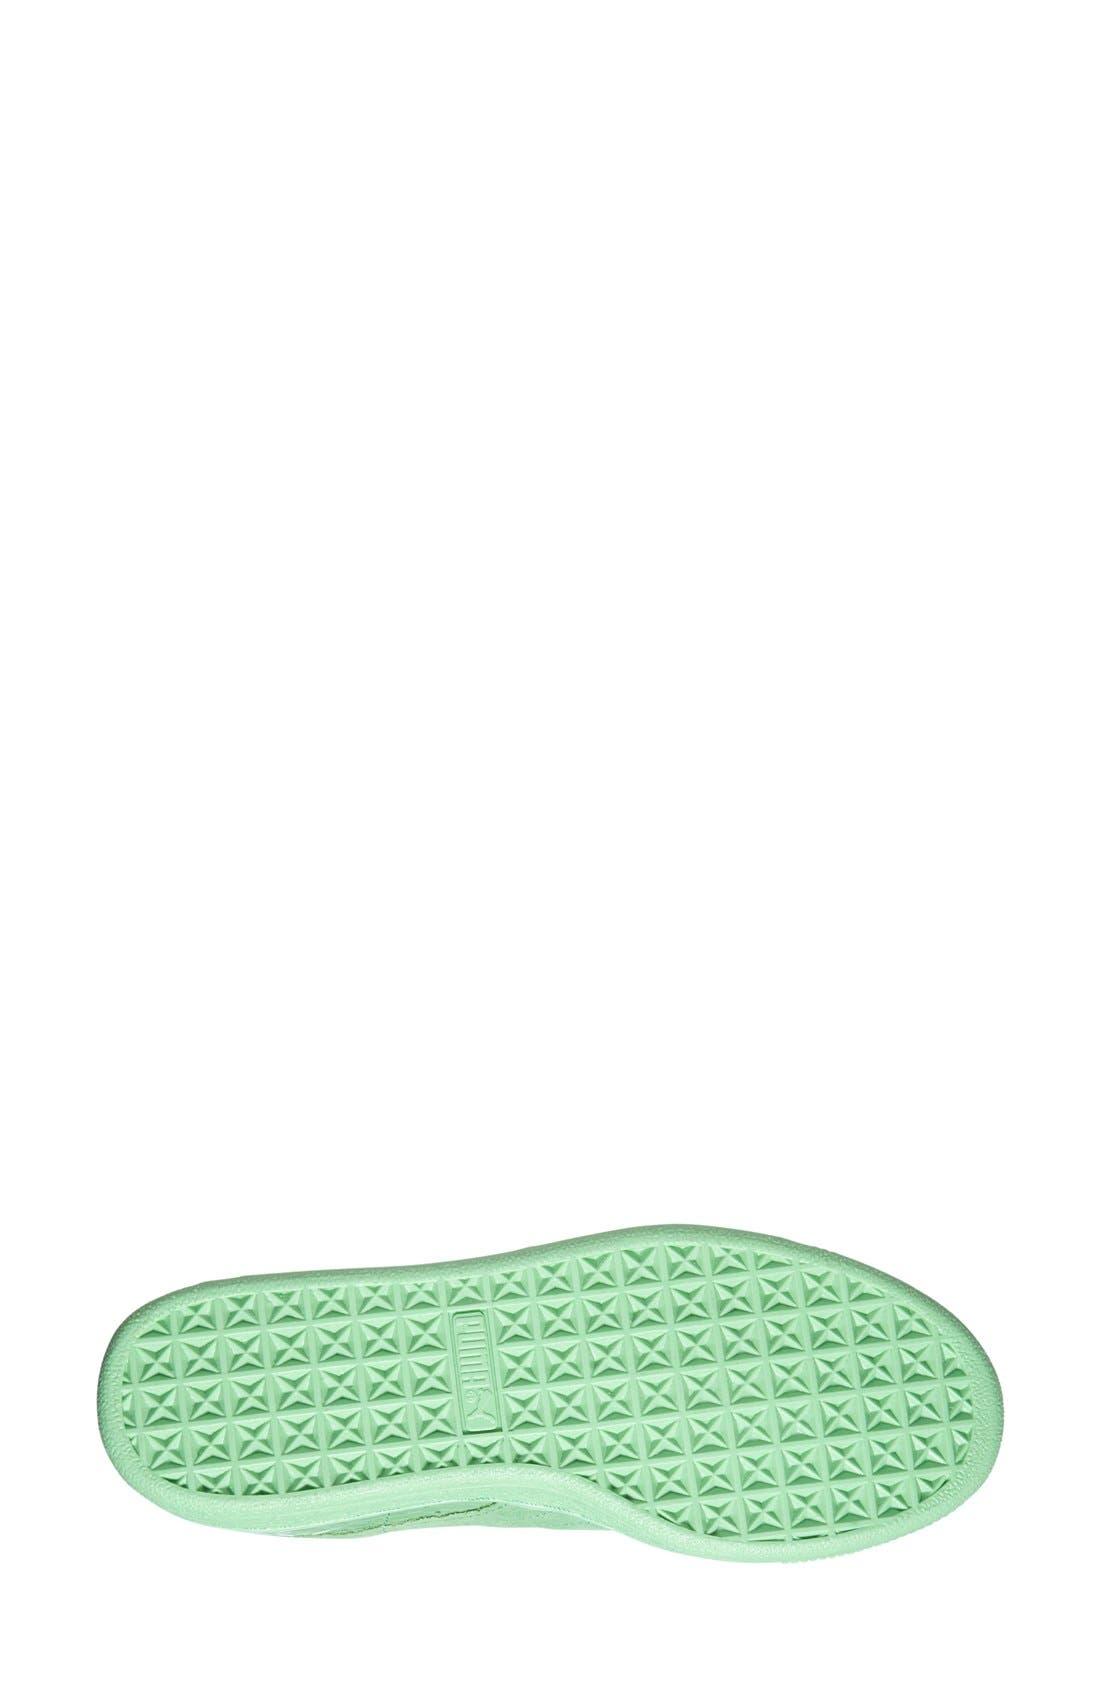 'Suede Classic - Solange' Sneaker,                             Alternate thumbnail 4, color,                             300